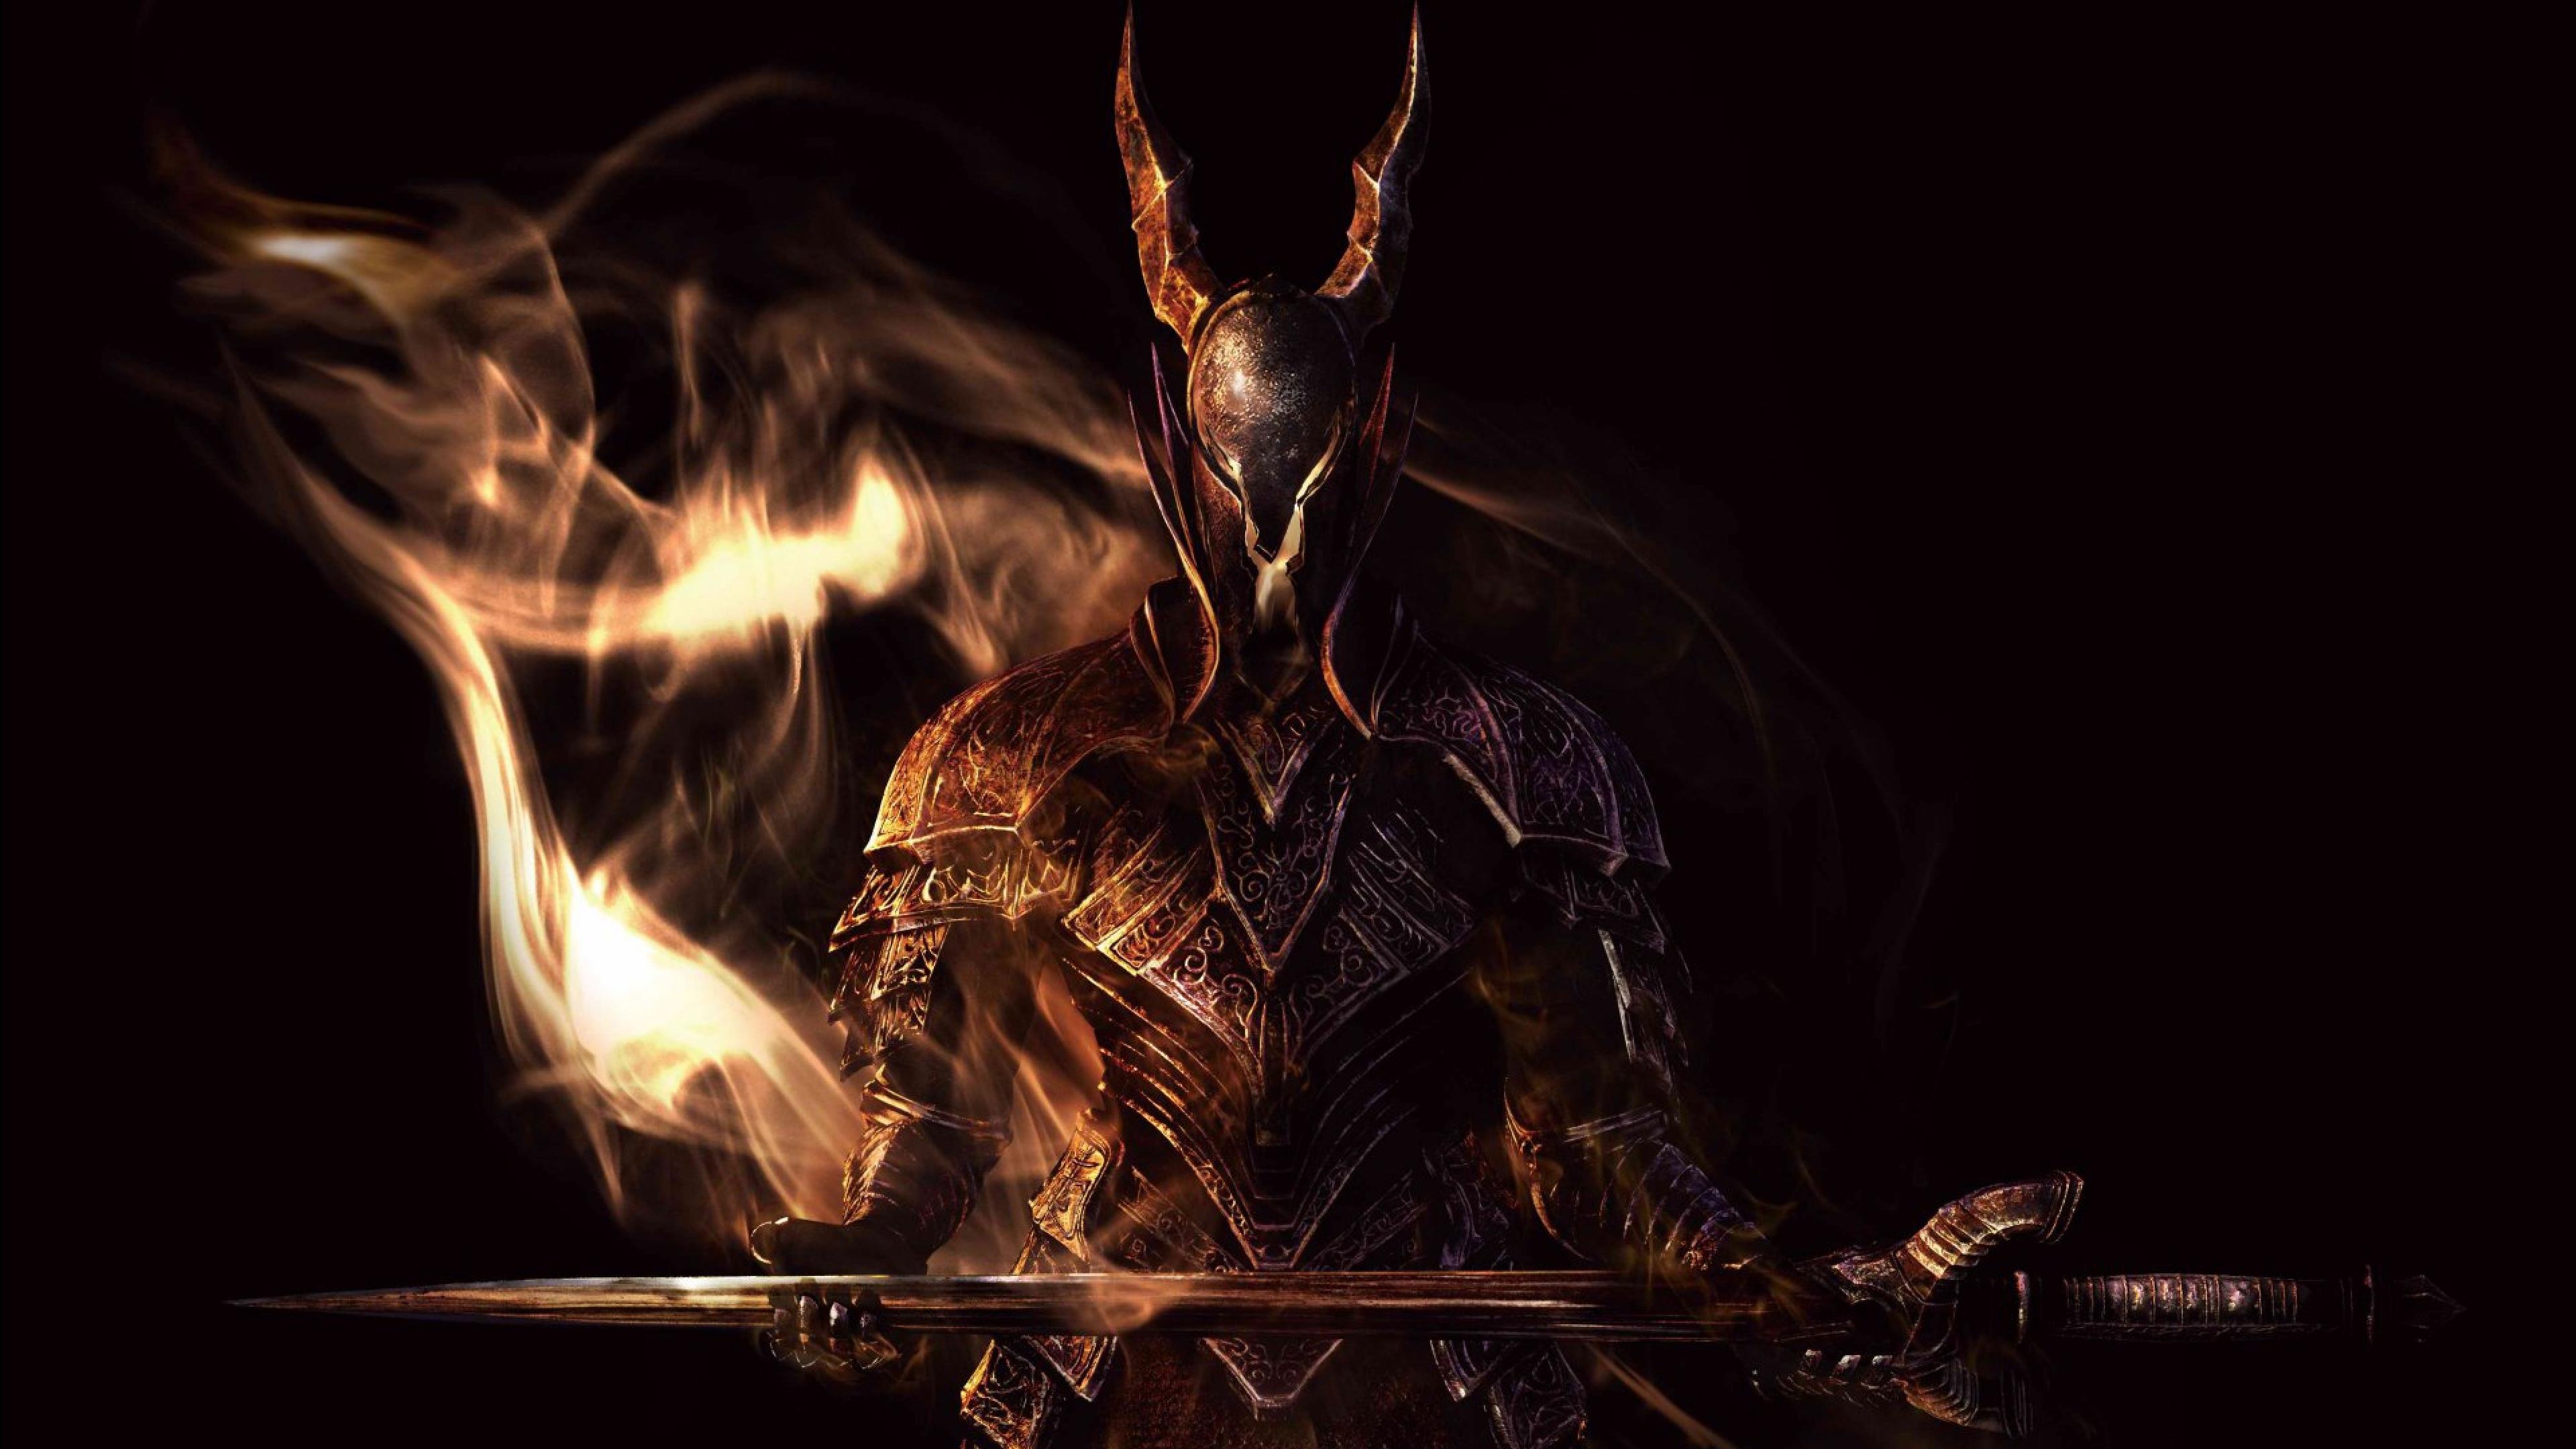 Dark Souls 3 4k Wallpaper: Dark Souls 4K Wallpaper